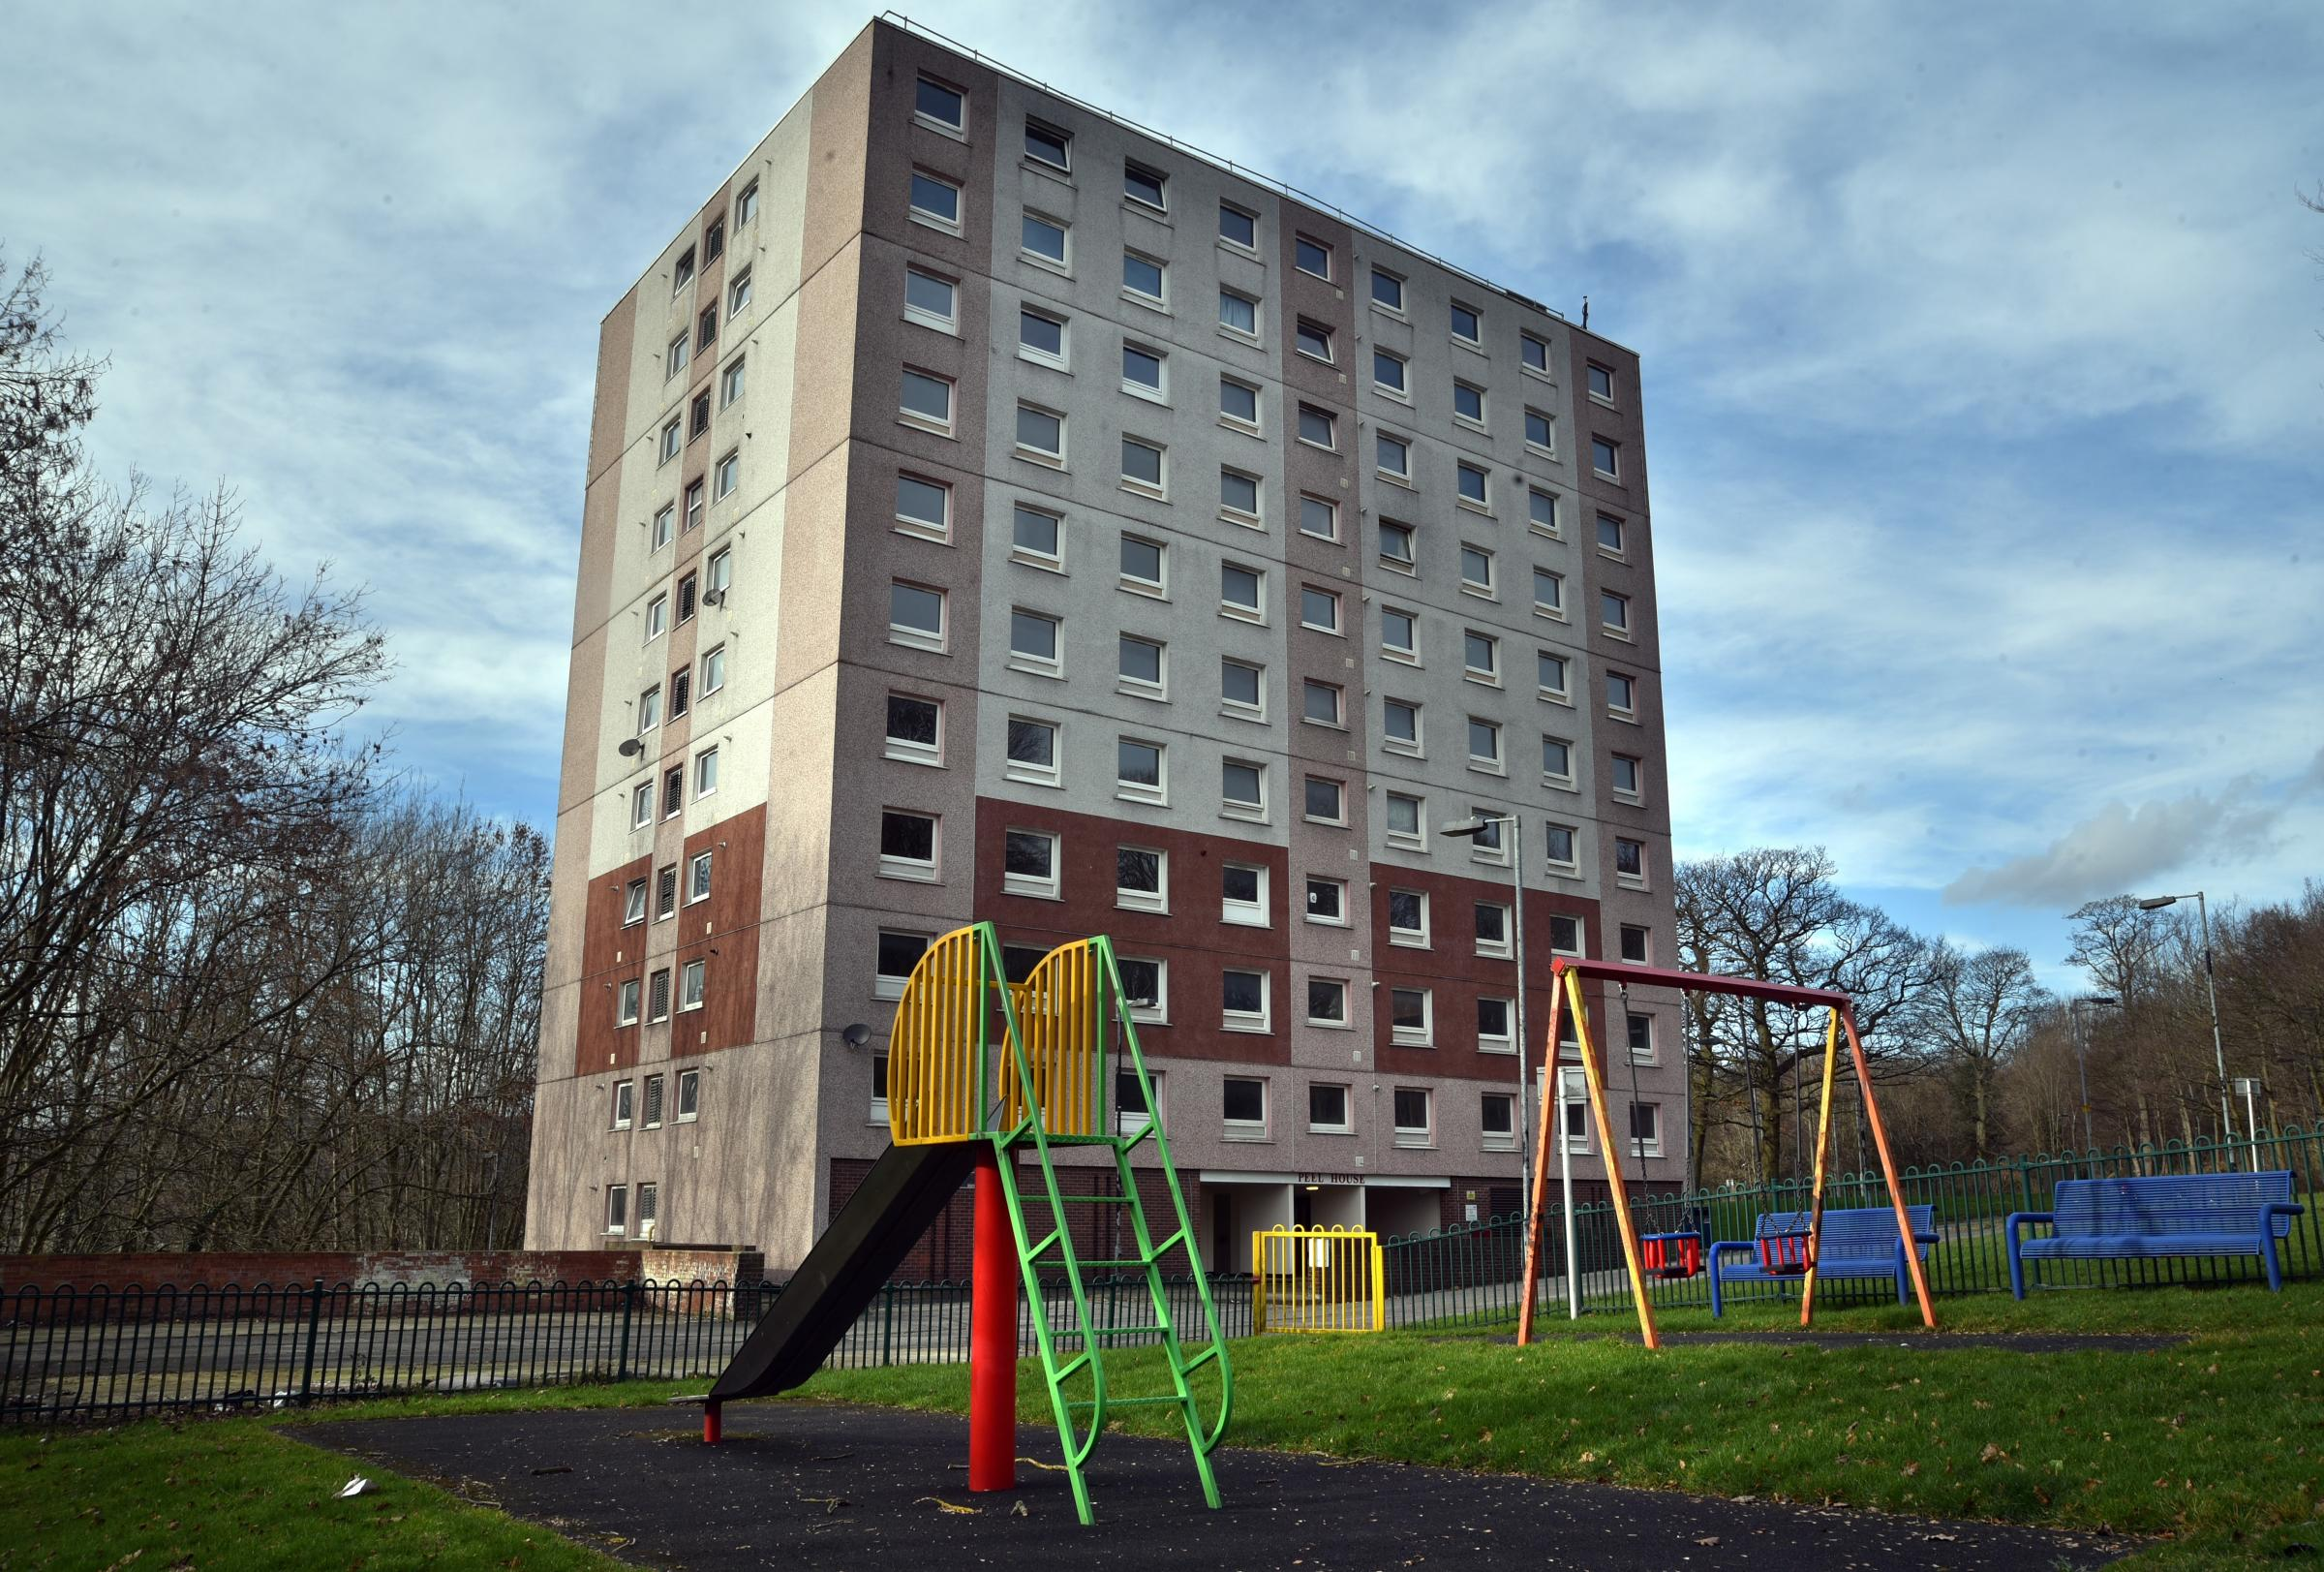 Demolition of Bingley flats to last three months